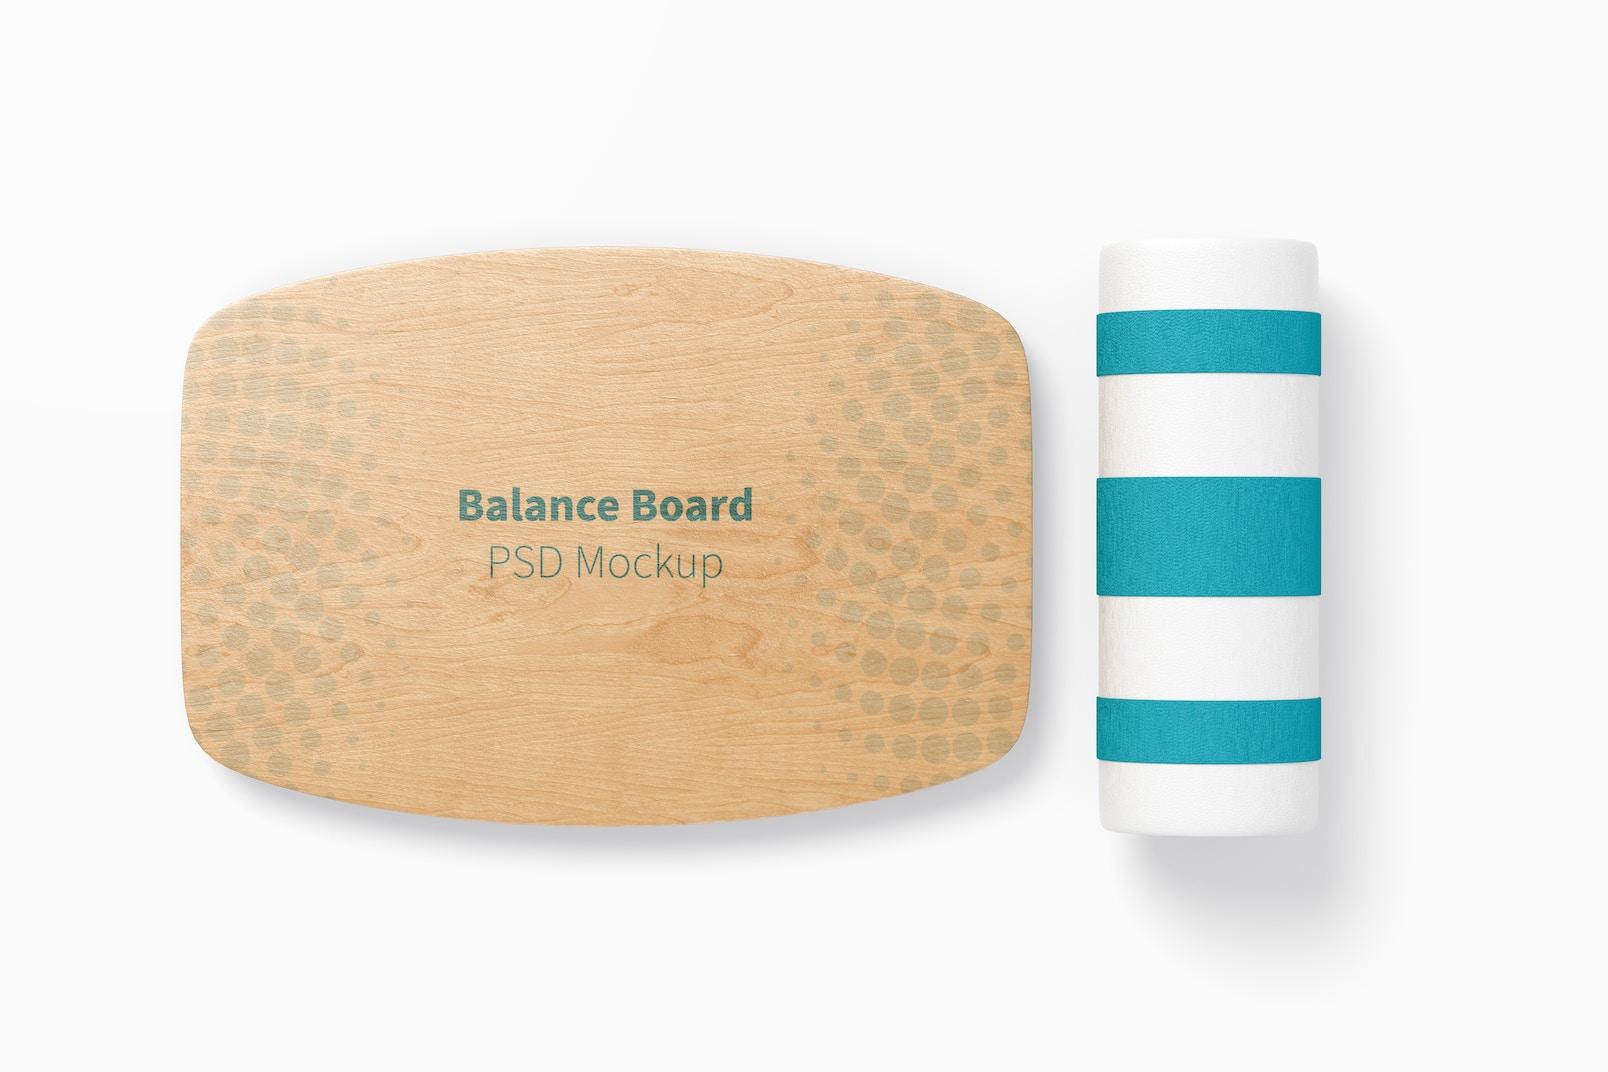 Balance Board Mockup, Top View